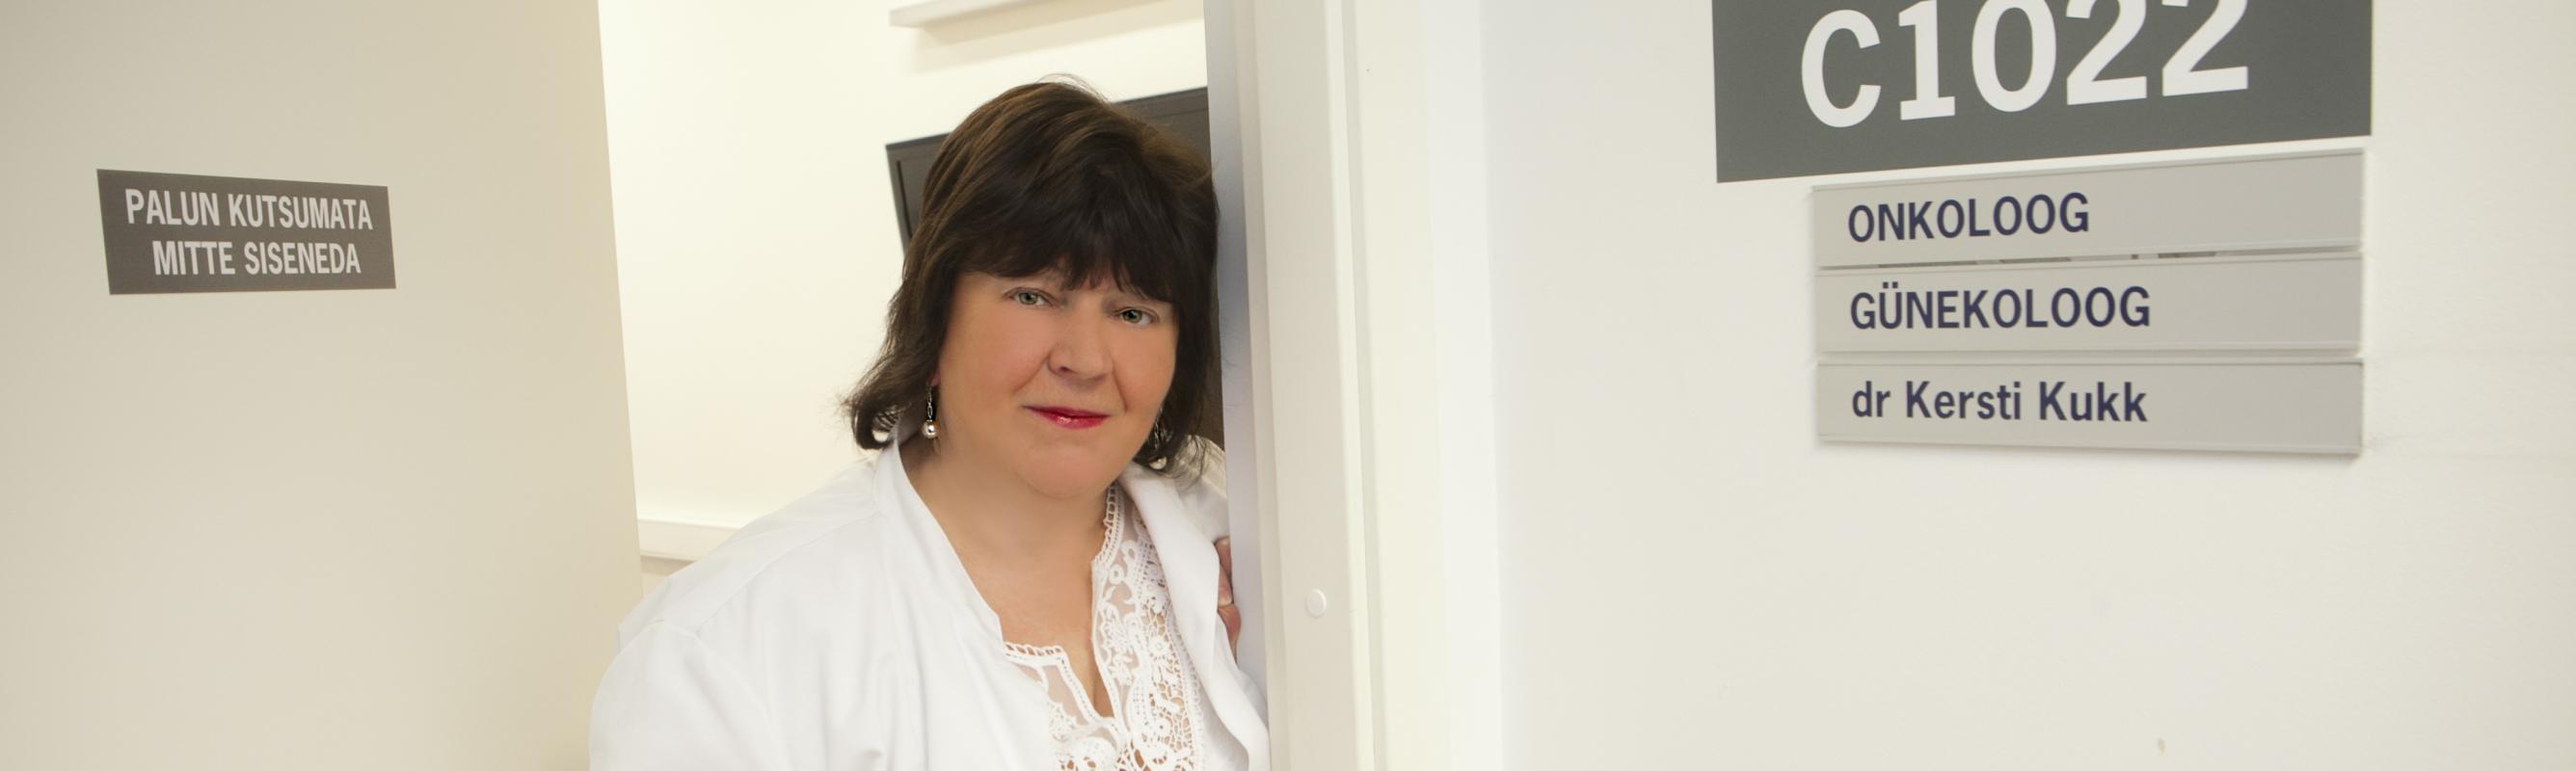 Keskuse juhataja dr Kersti Kukk